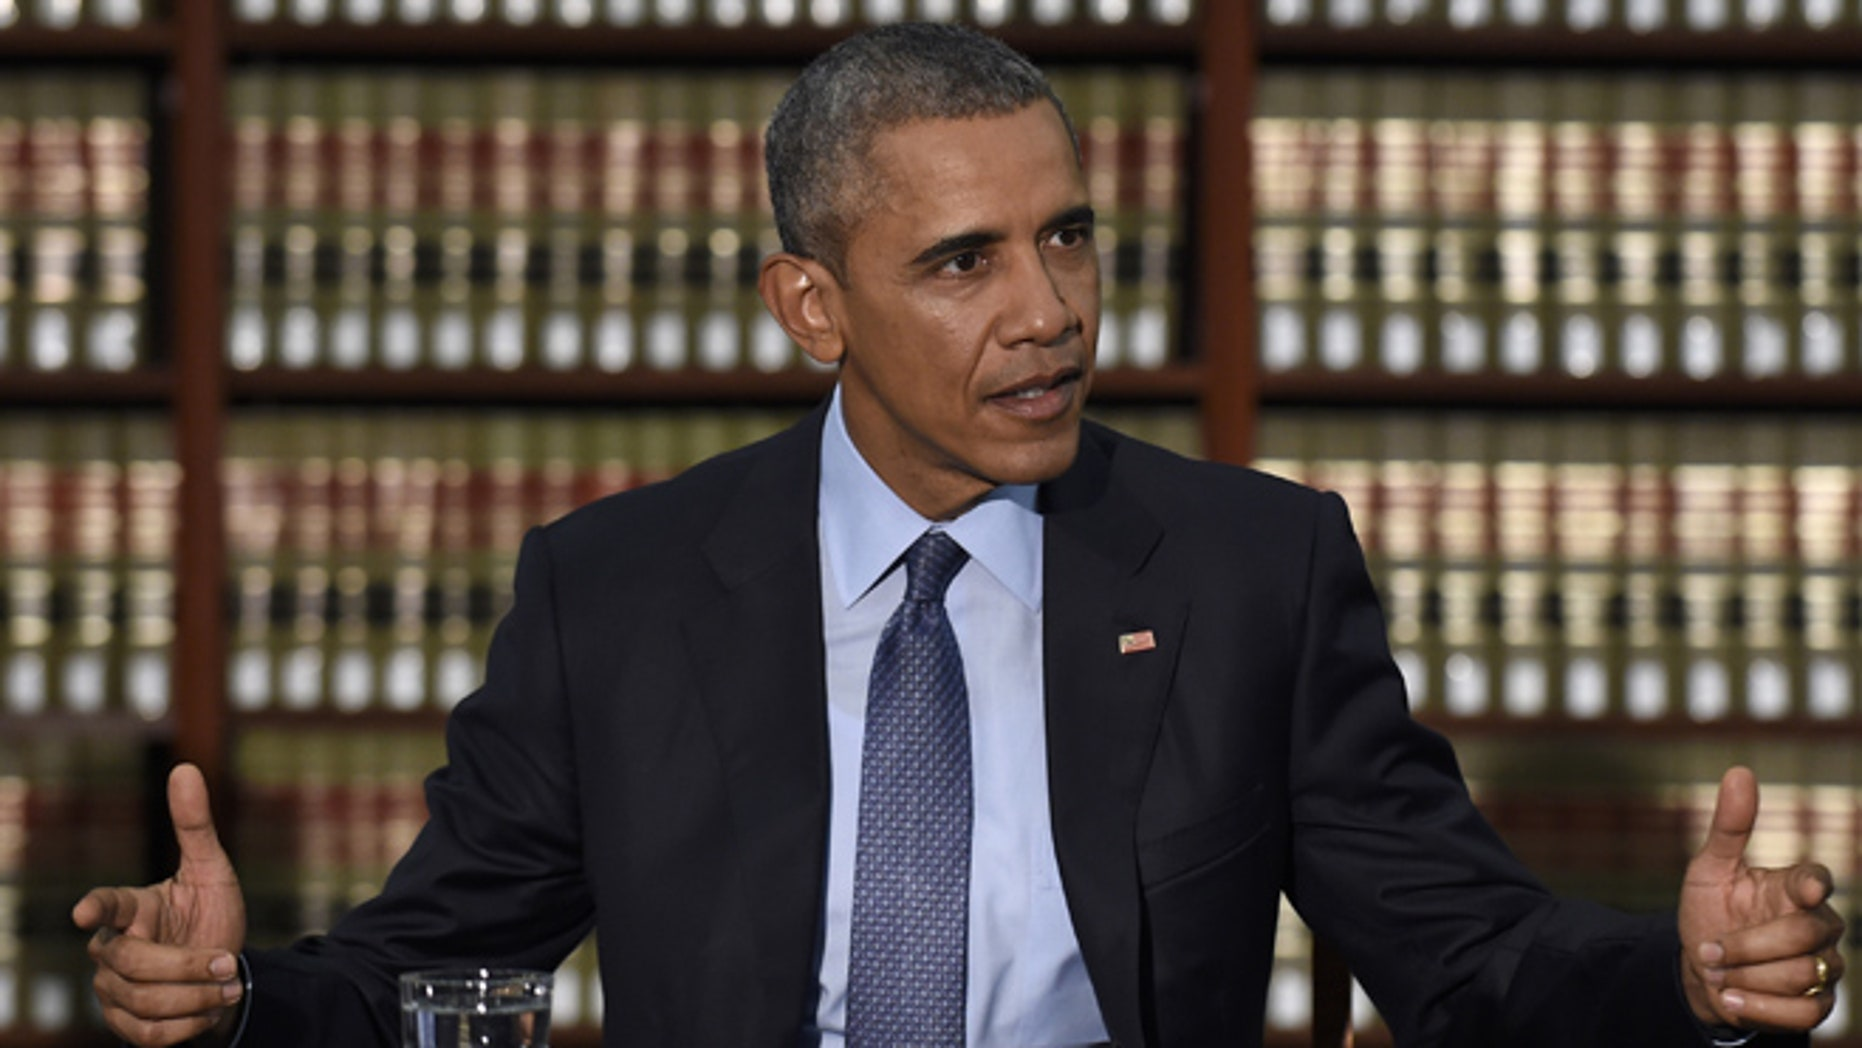 Nov. 2, 2015: President Obama at Newark Rutgers University Center for Law and Justice in Newark, N.J.